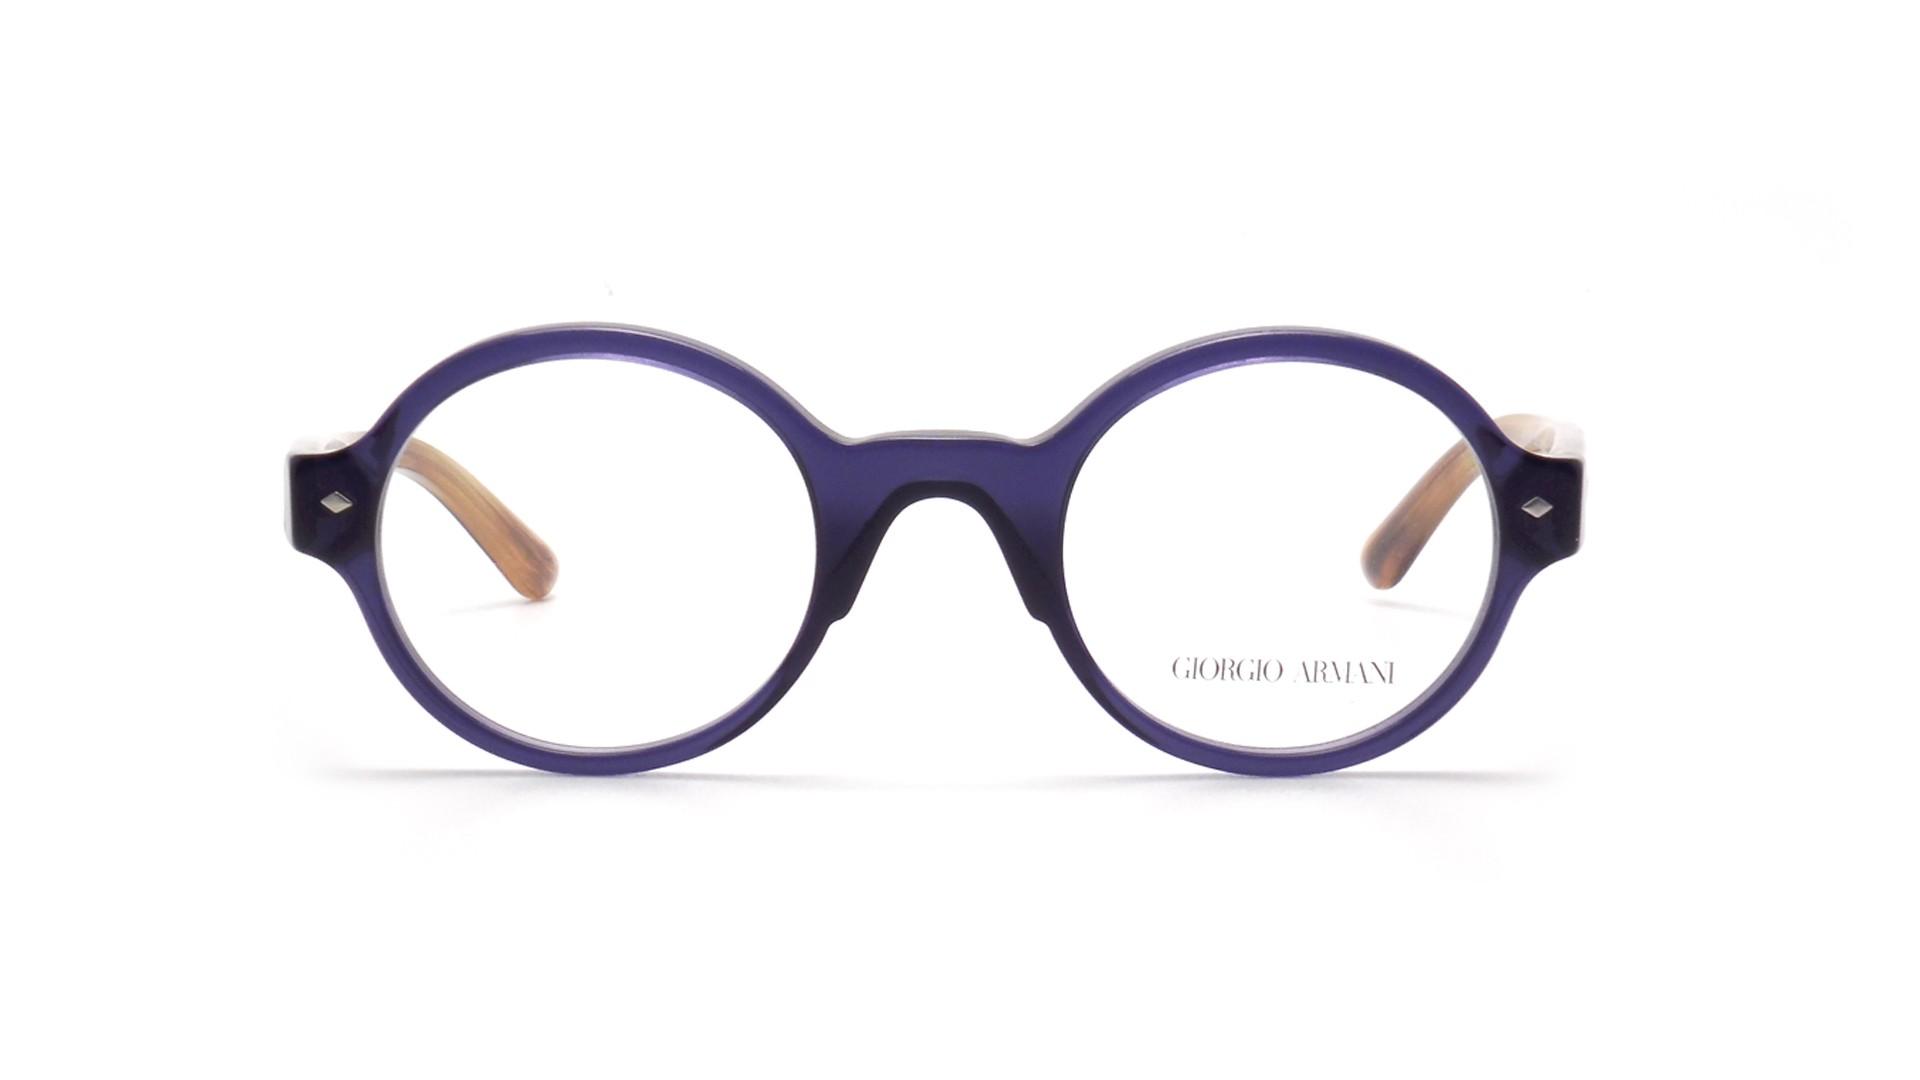 dfbc67d4766 Armani Eyeglass Frames Discount